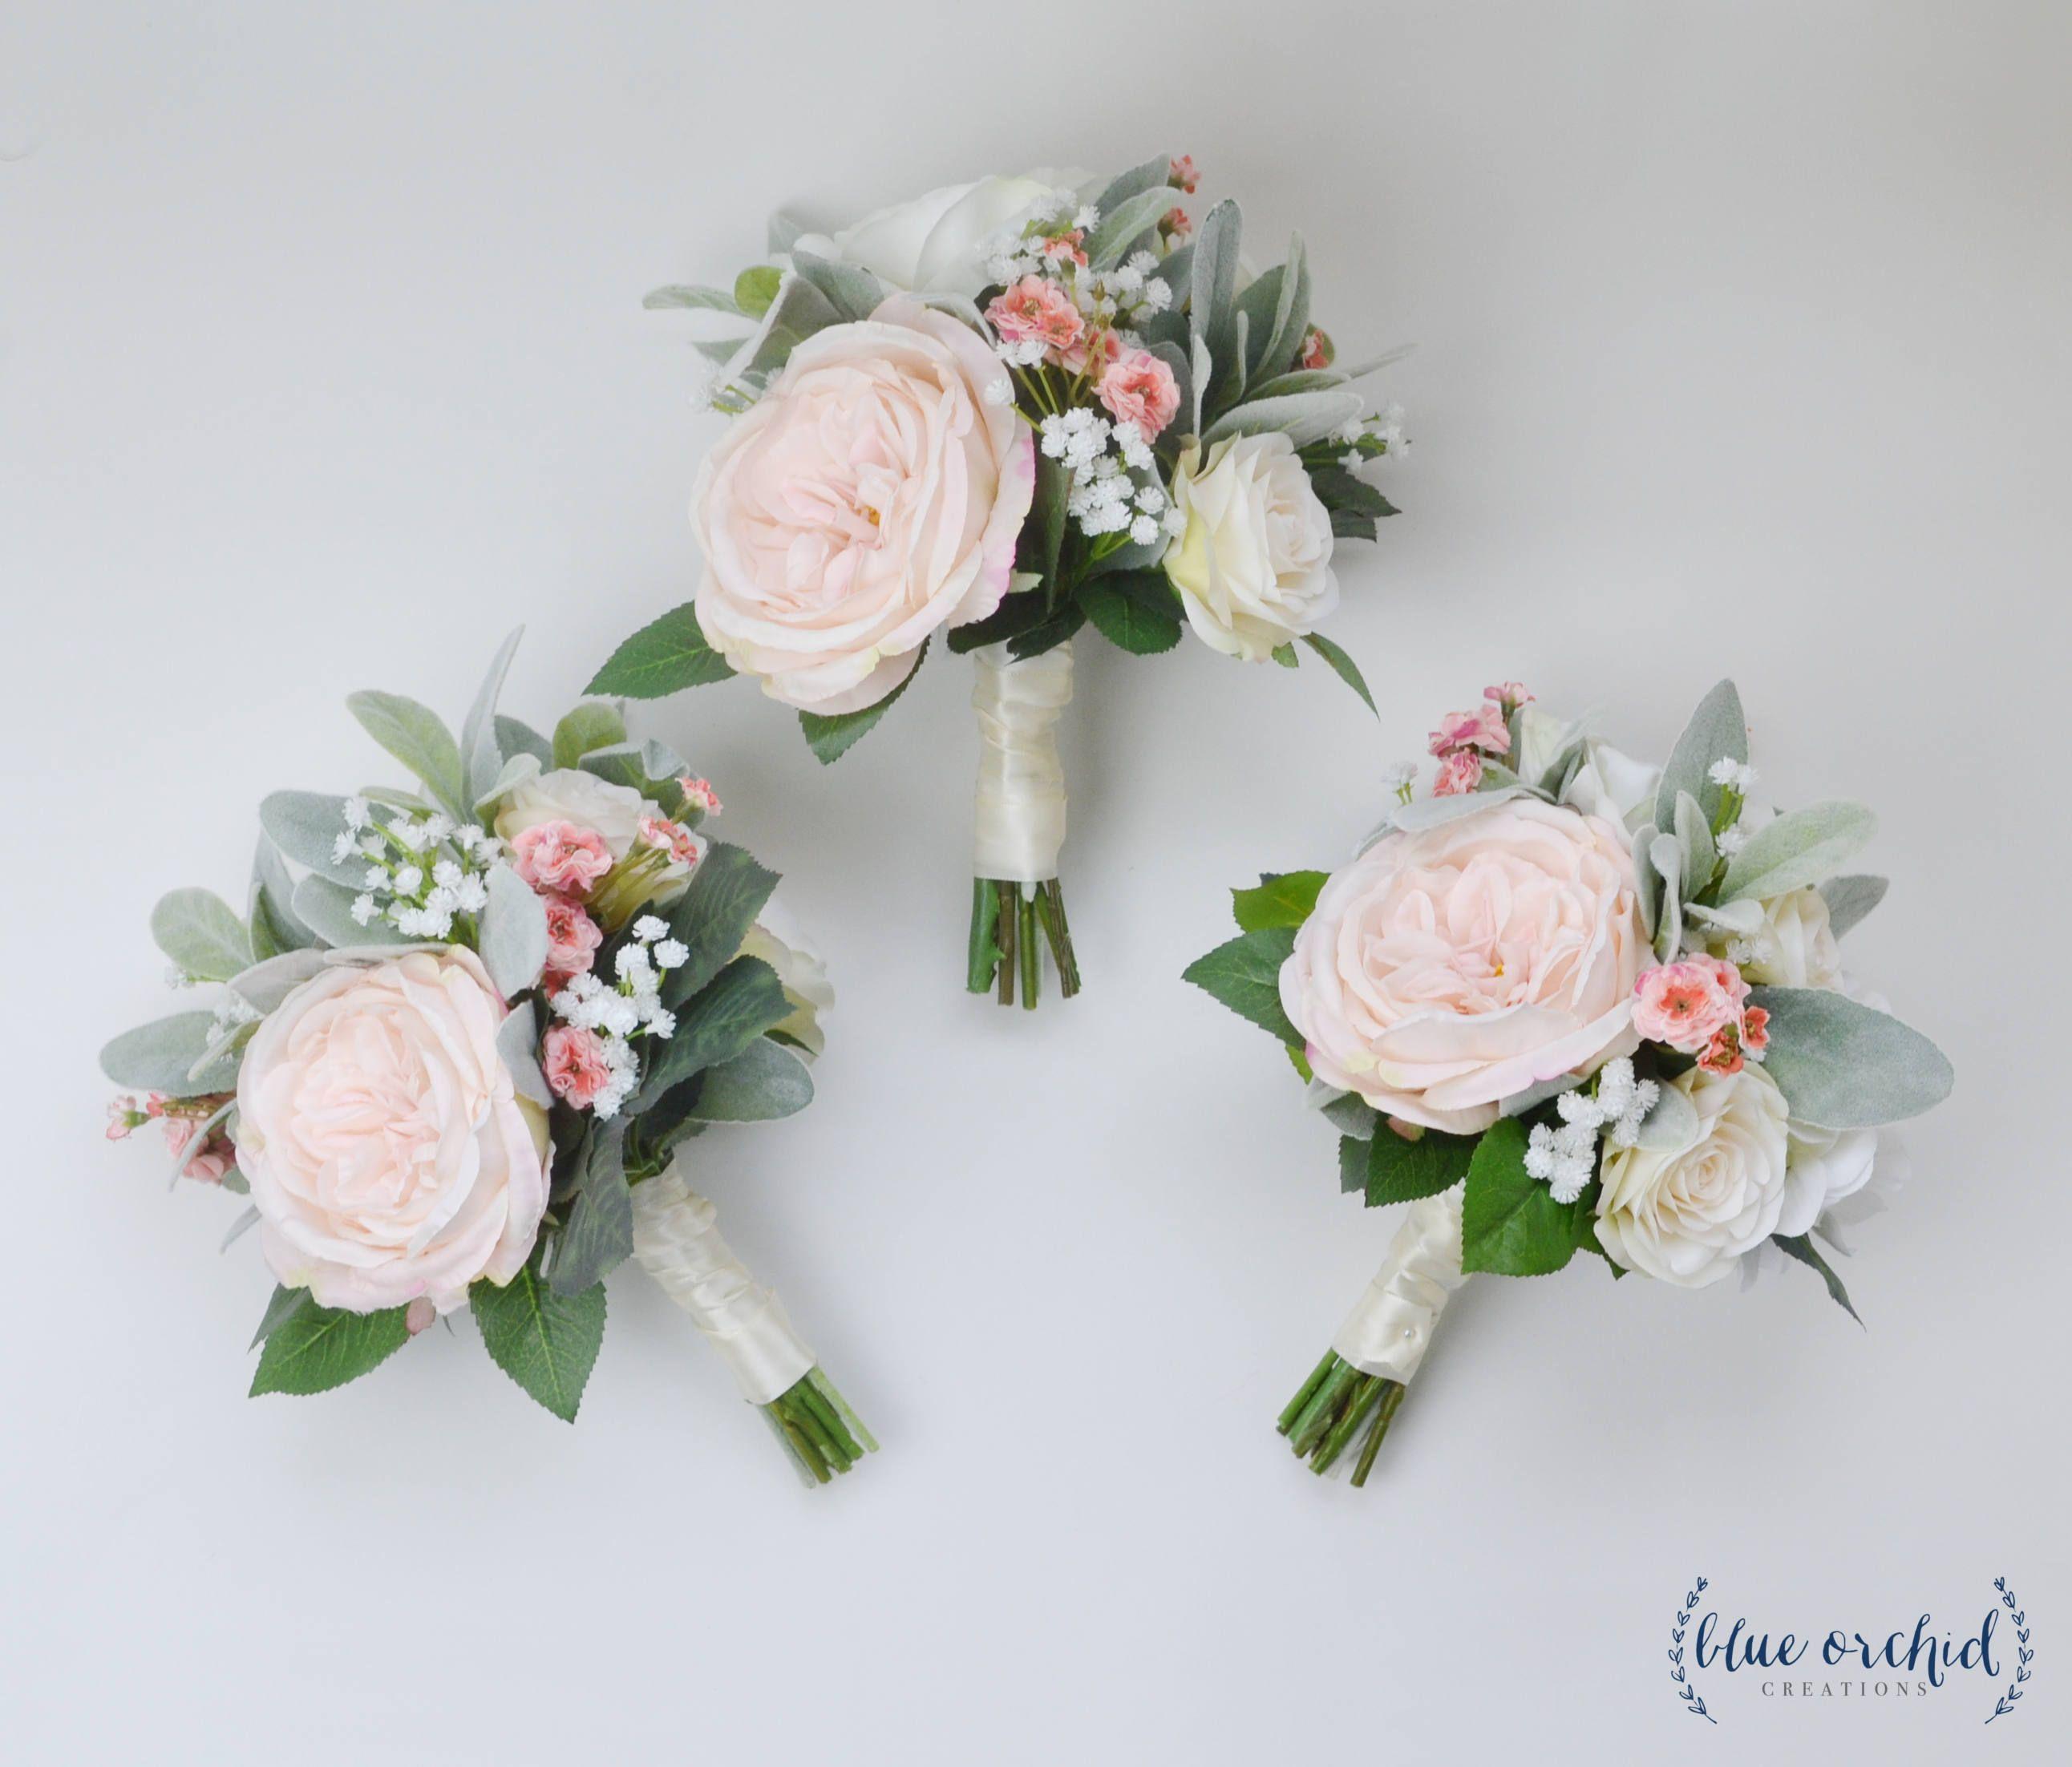 Wedding Flowers, Bridesmaid Bouquet, Bridesmaid Bouquet, Boho Bouquet, Boho Wedding Flowers, Pink Bouquet, White, Pink, Wedding Flower Set